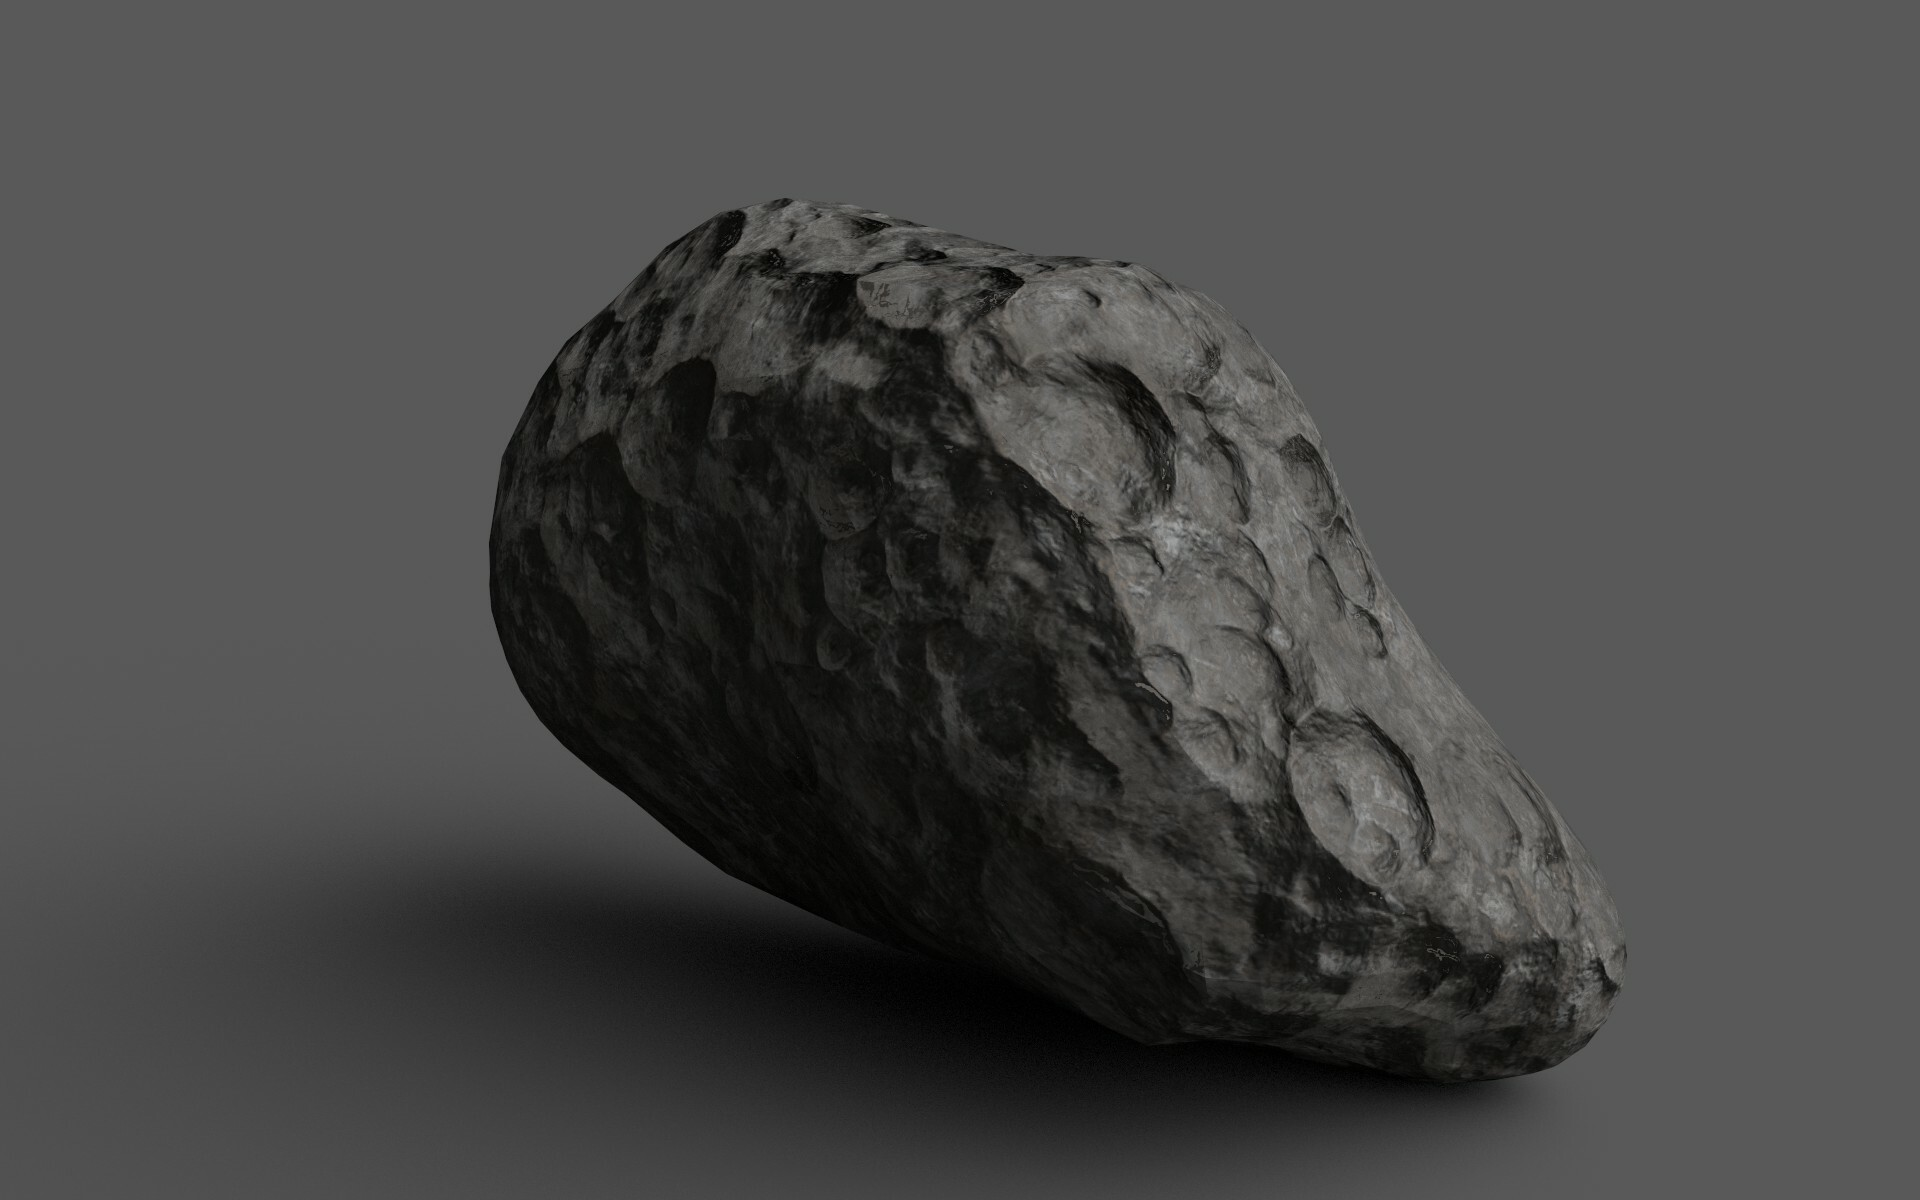 704 polygons 4096 texture